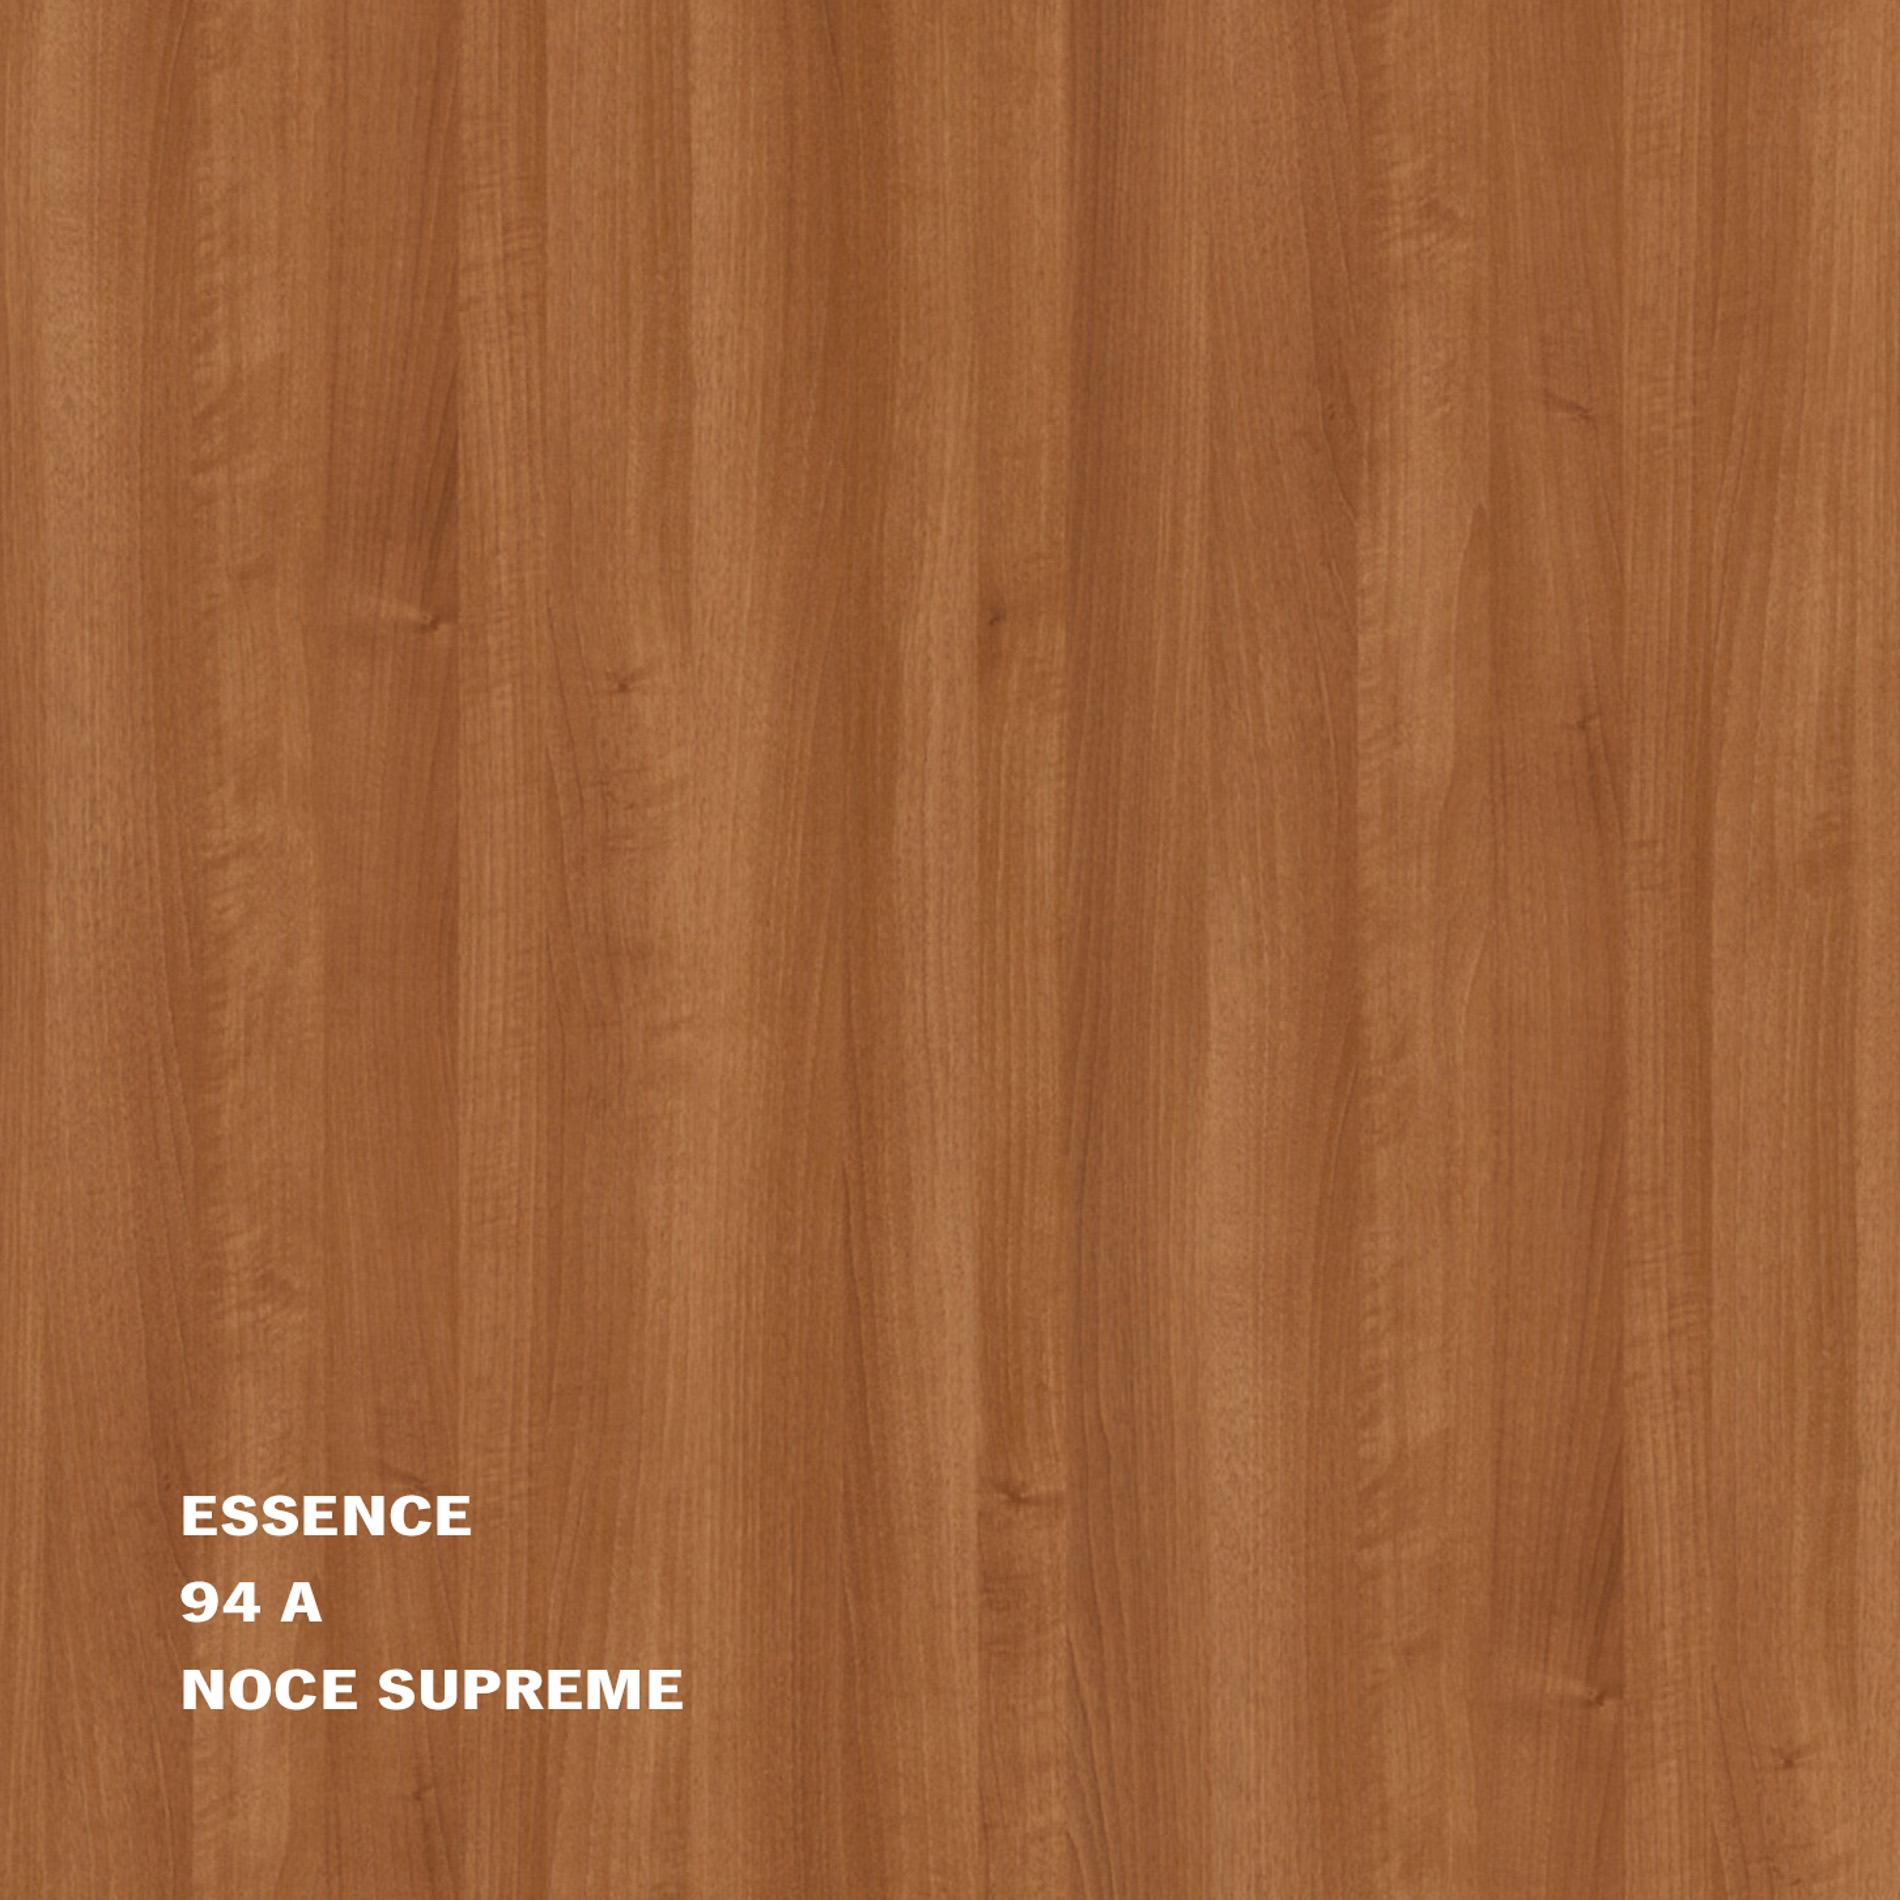 94A_NOCE SUPREME_ESSENCE